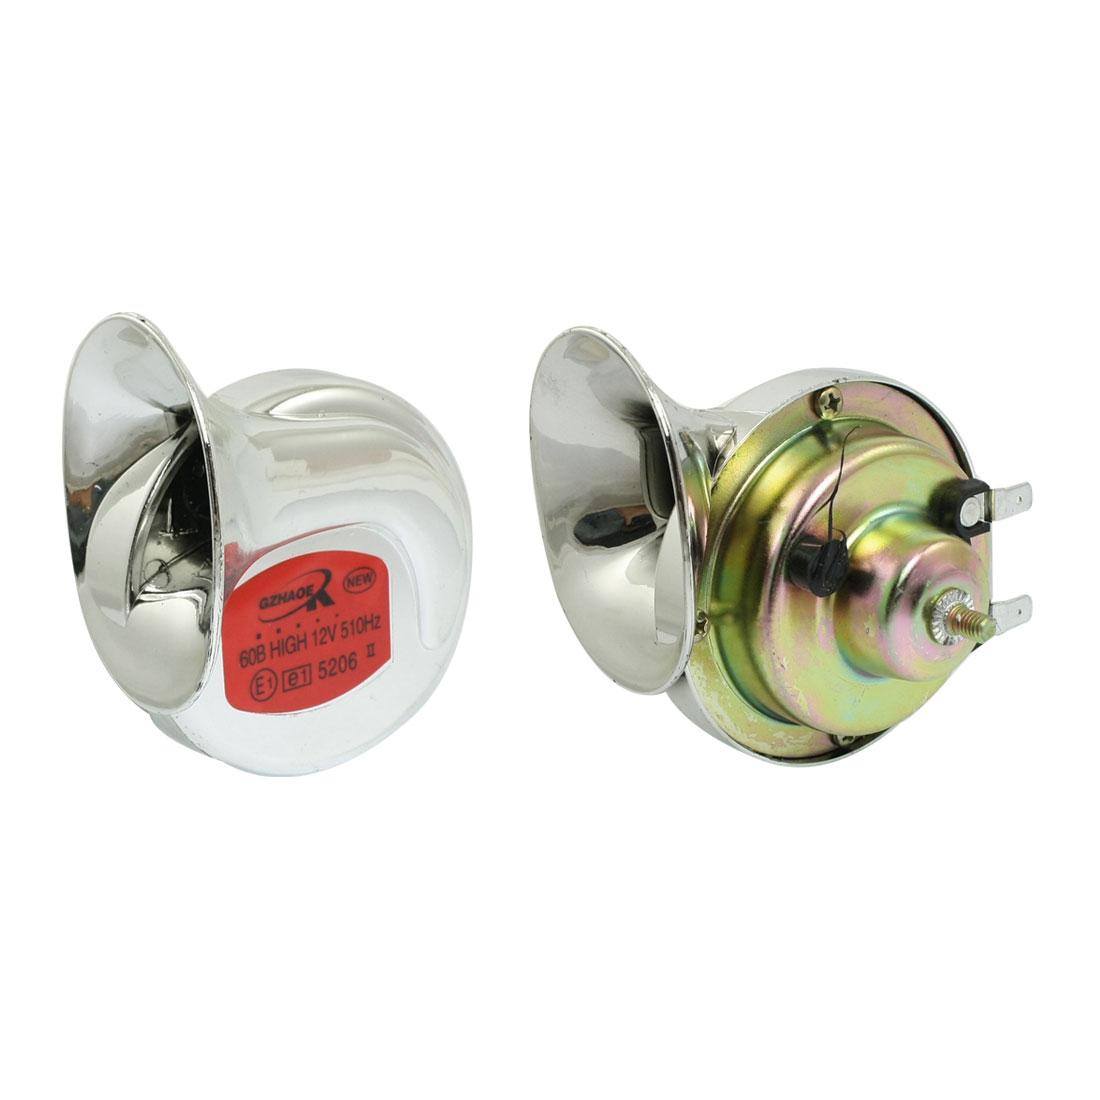 Universal 12V 105dB Auto Car Electric Snail Horn Siren Silver Tone 2 Pcs